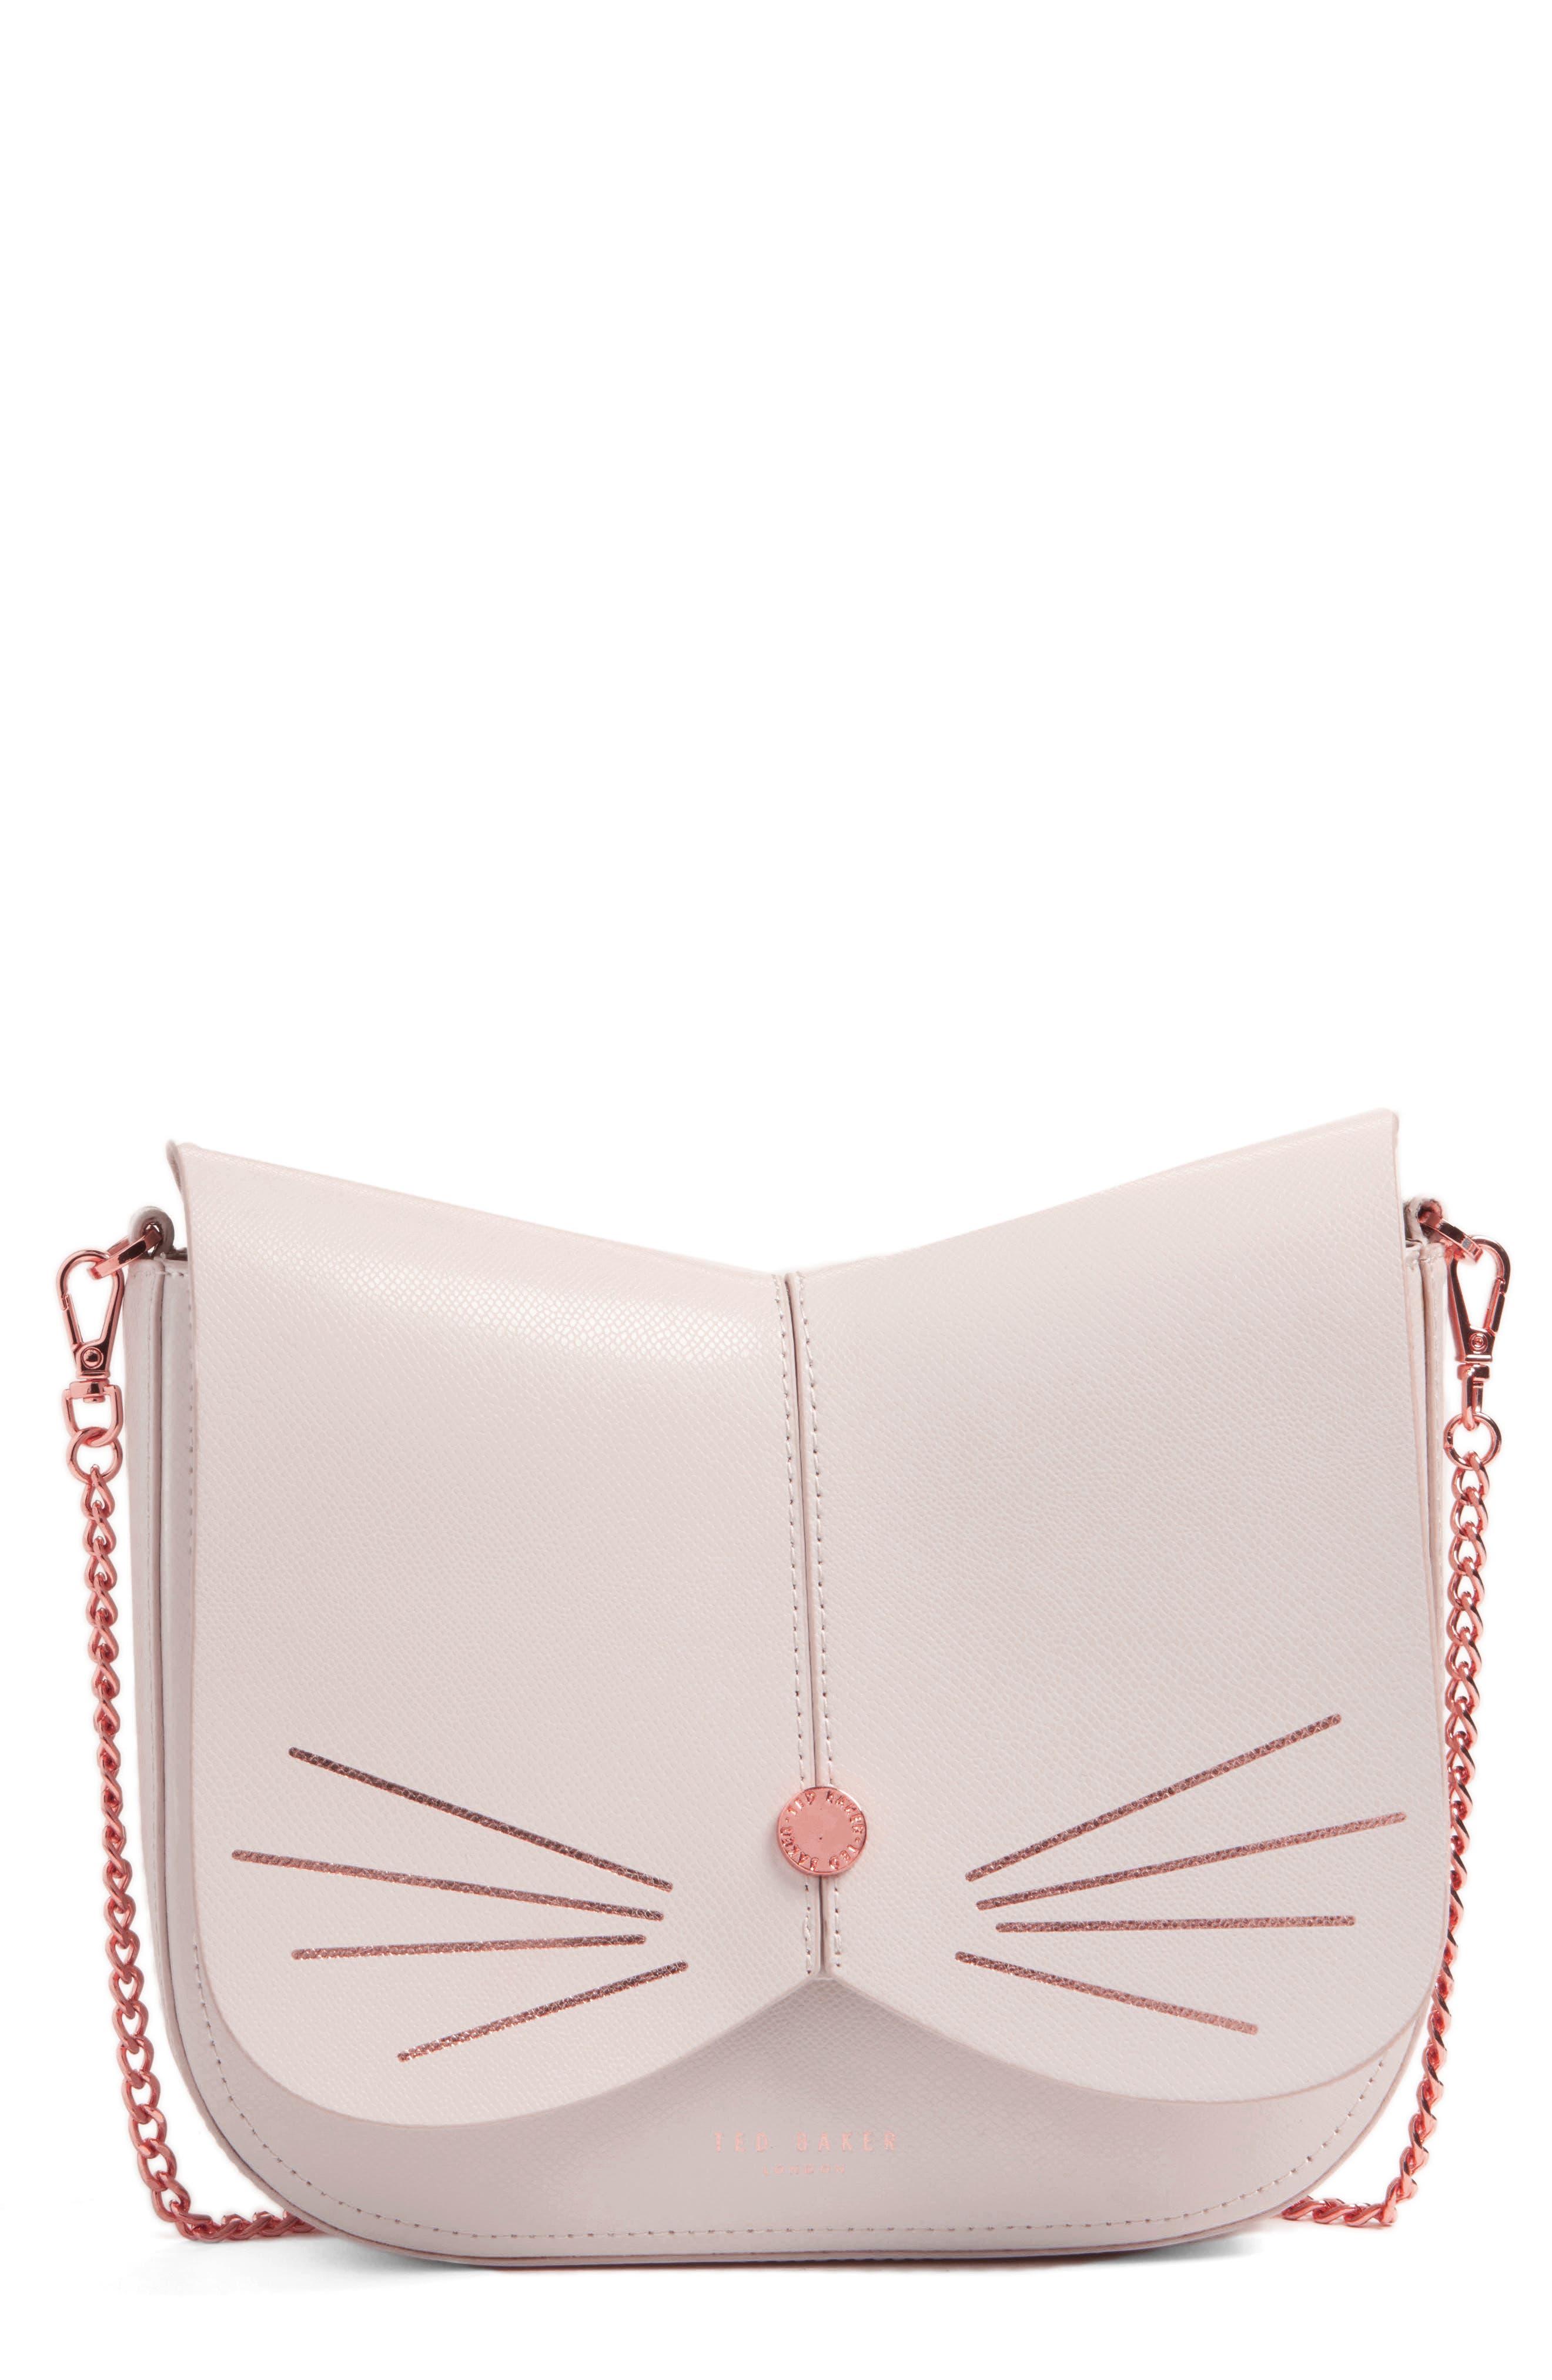 Main Image - Ted Baker London Cat Leather Crossbody Bag